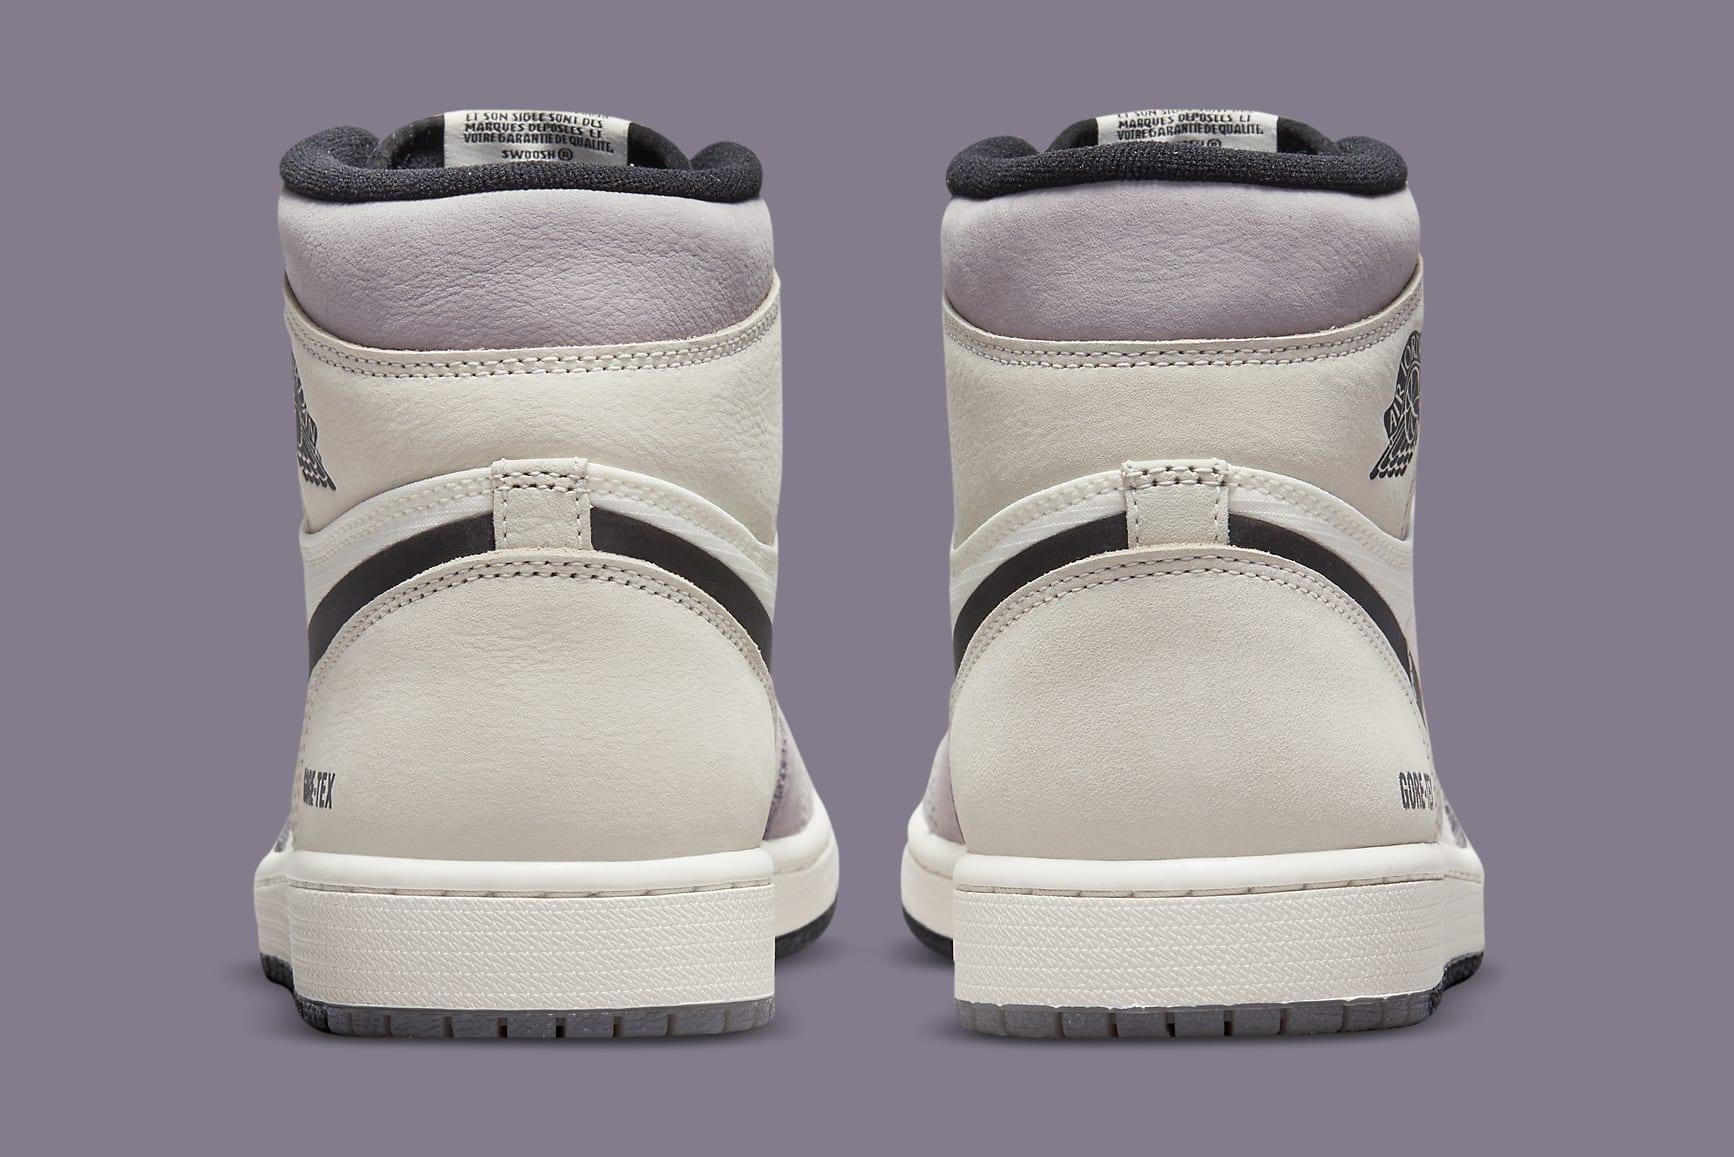 Air Jordan 1 High Gore-Tex 'Light Bone' DB2889 100 Heel